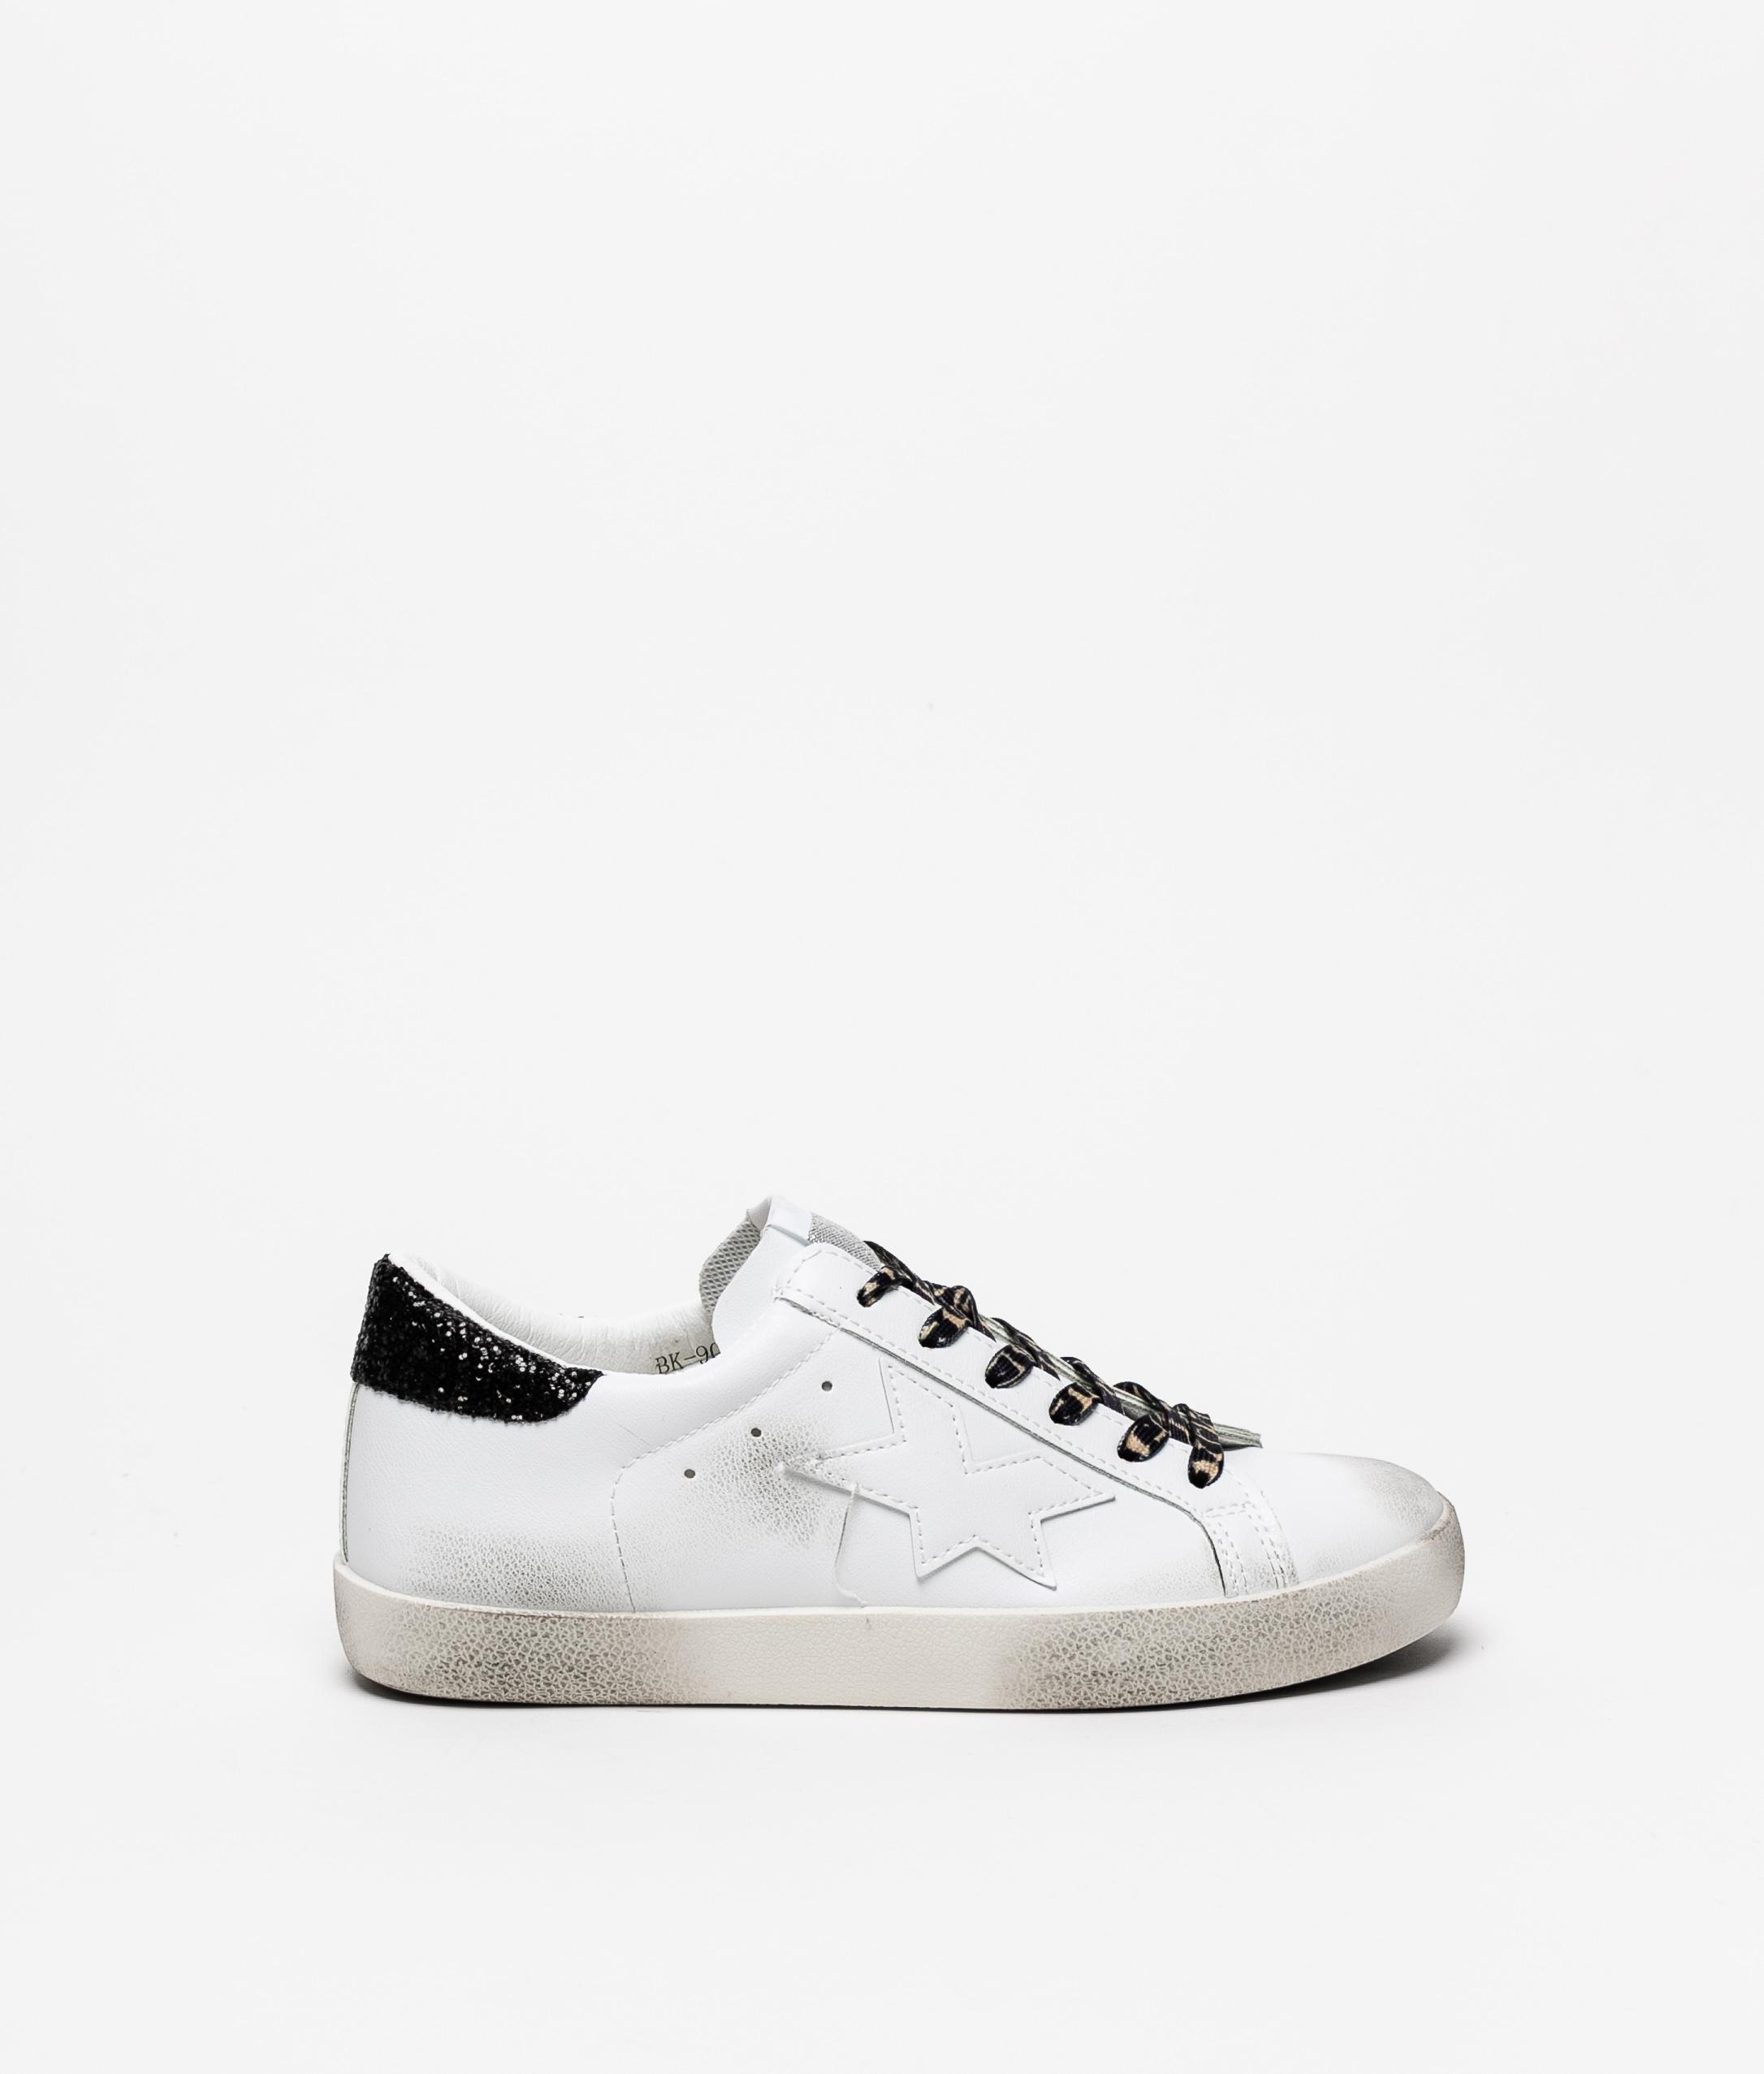 Sneakers Colir - White/Black